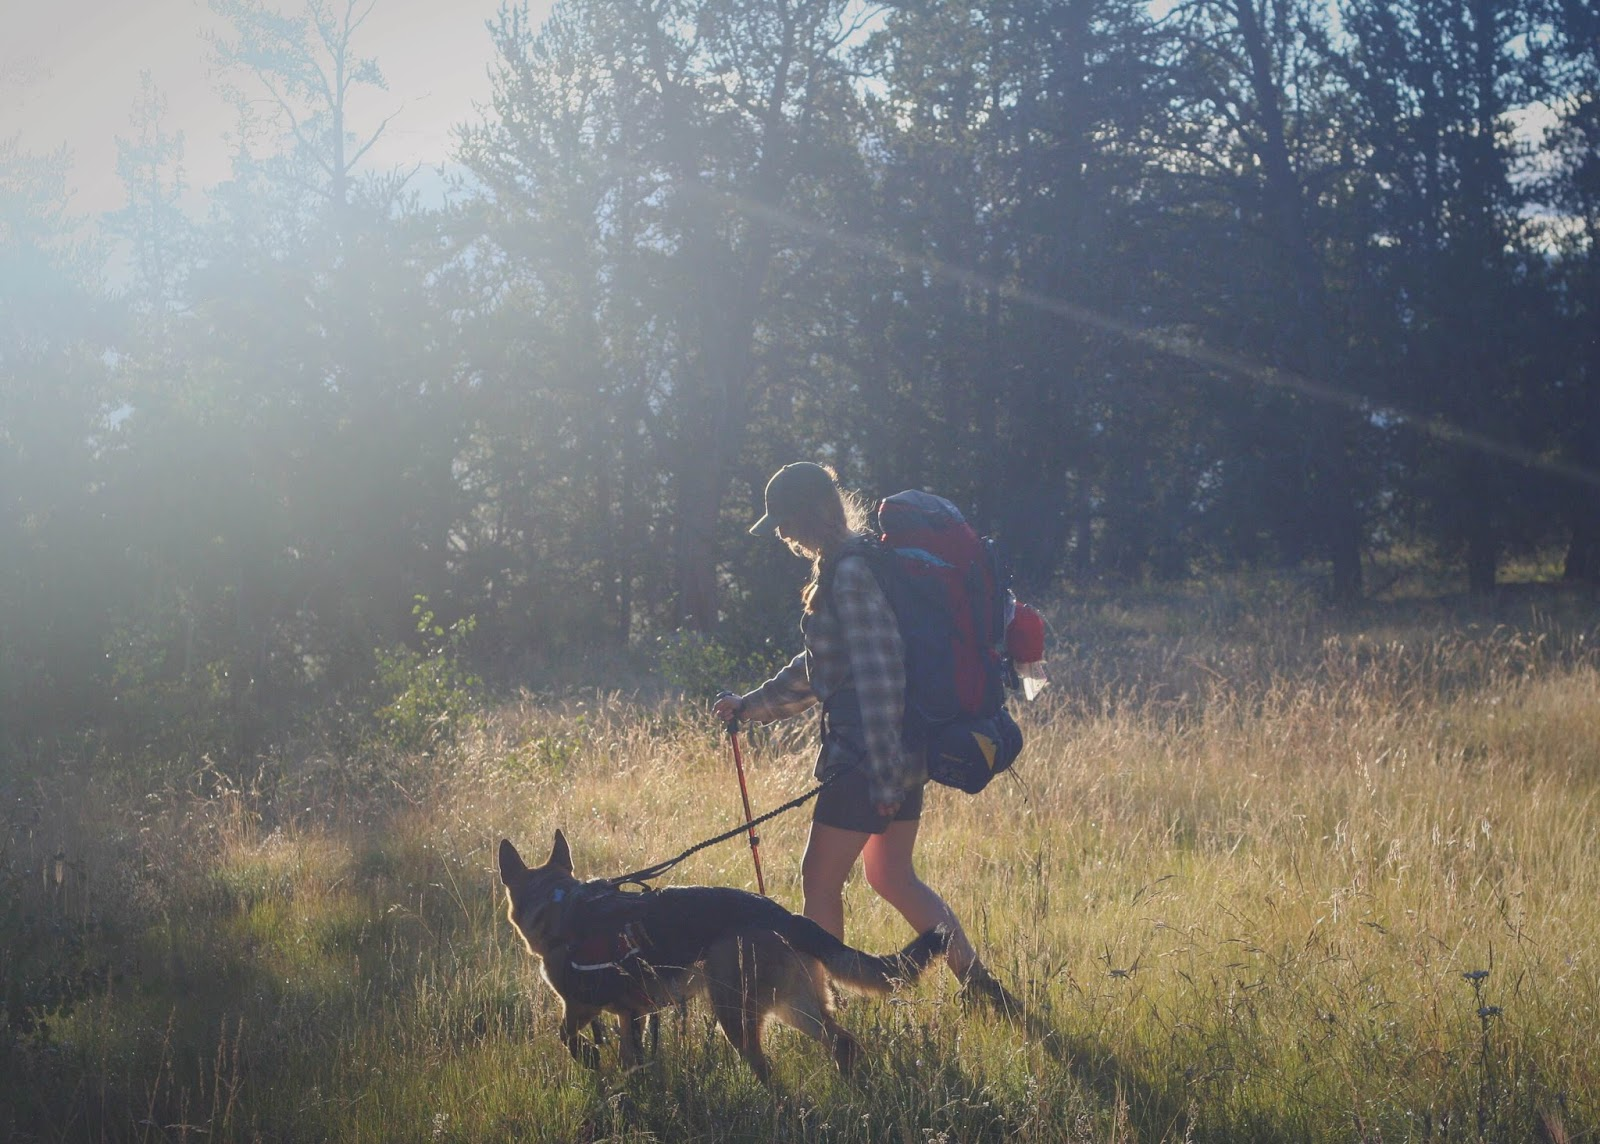 dailyn lewis adventure lifestyle hacks hiking trevor photo